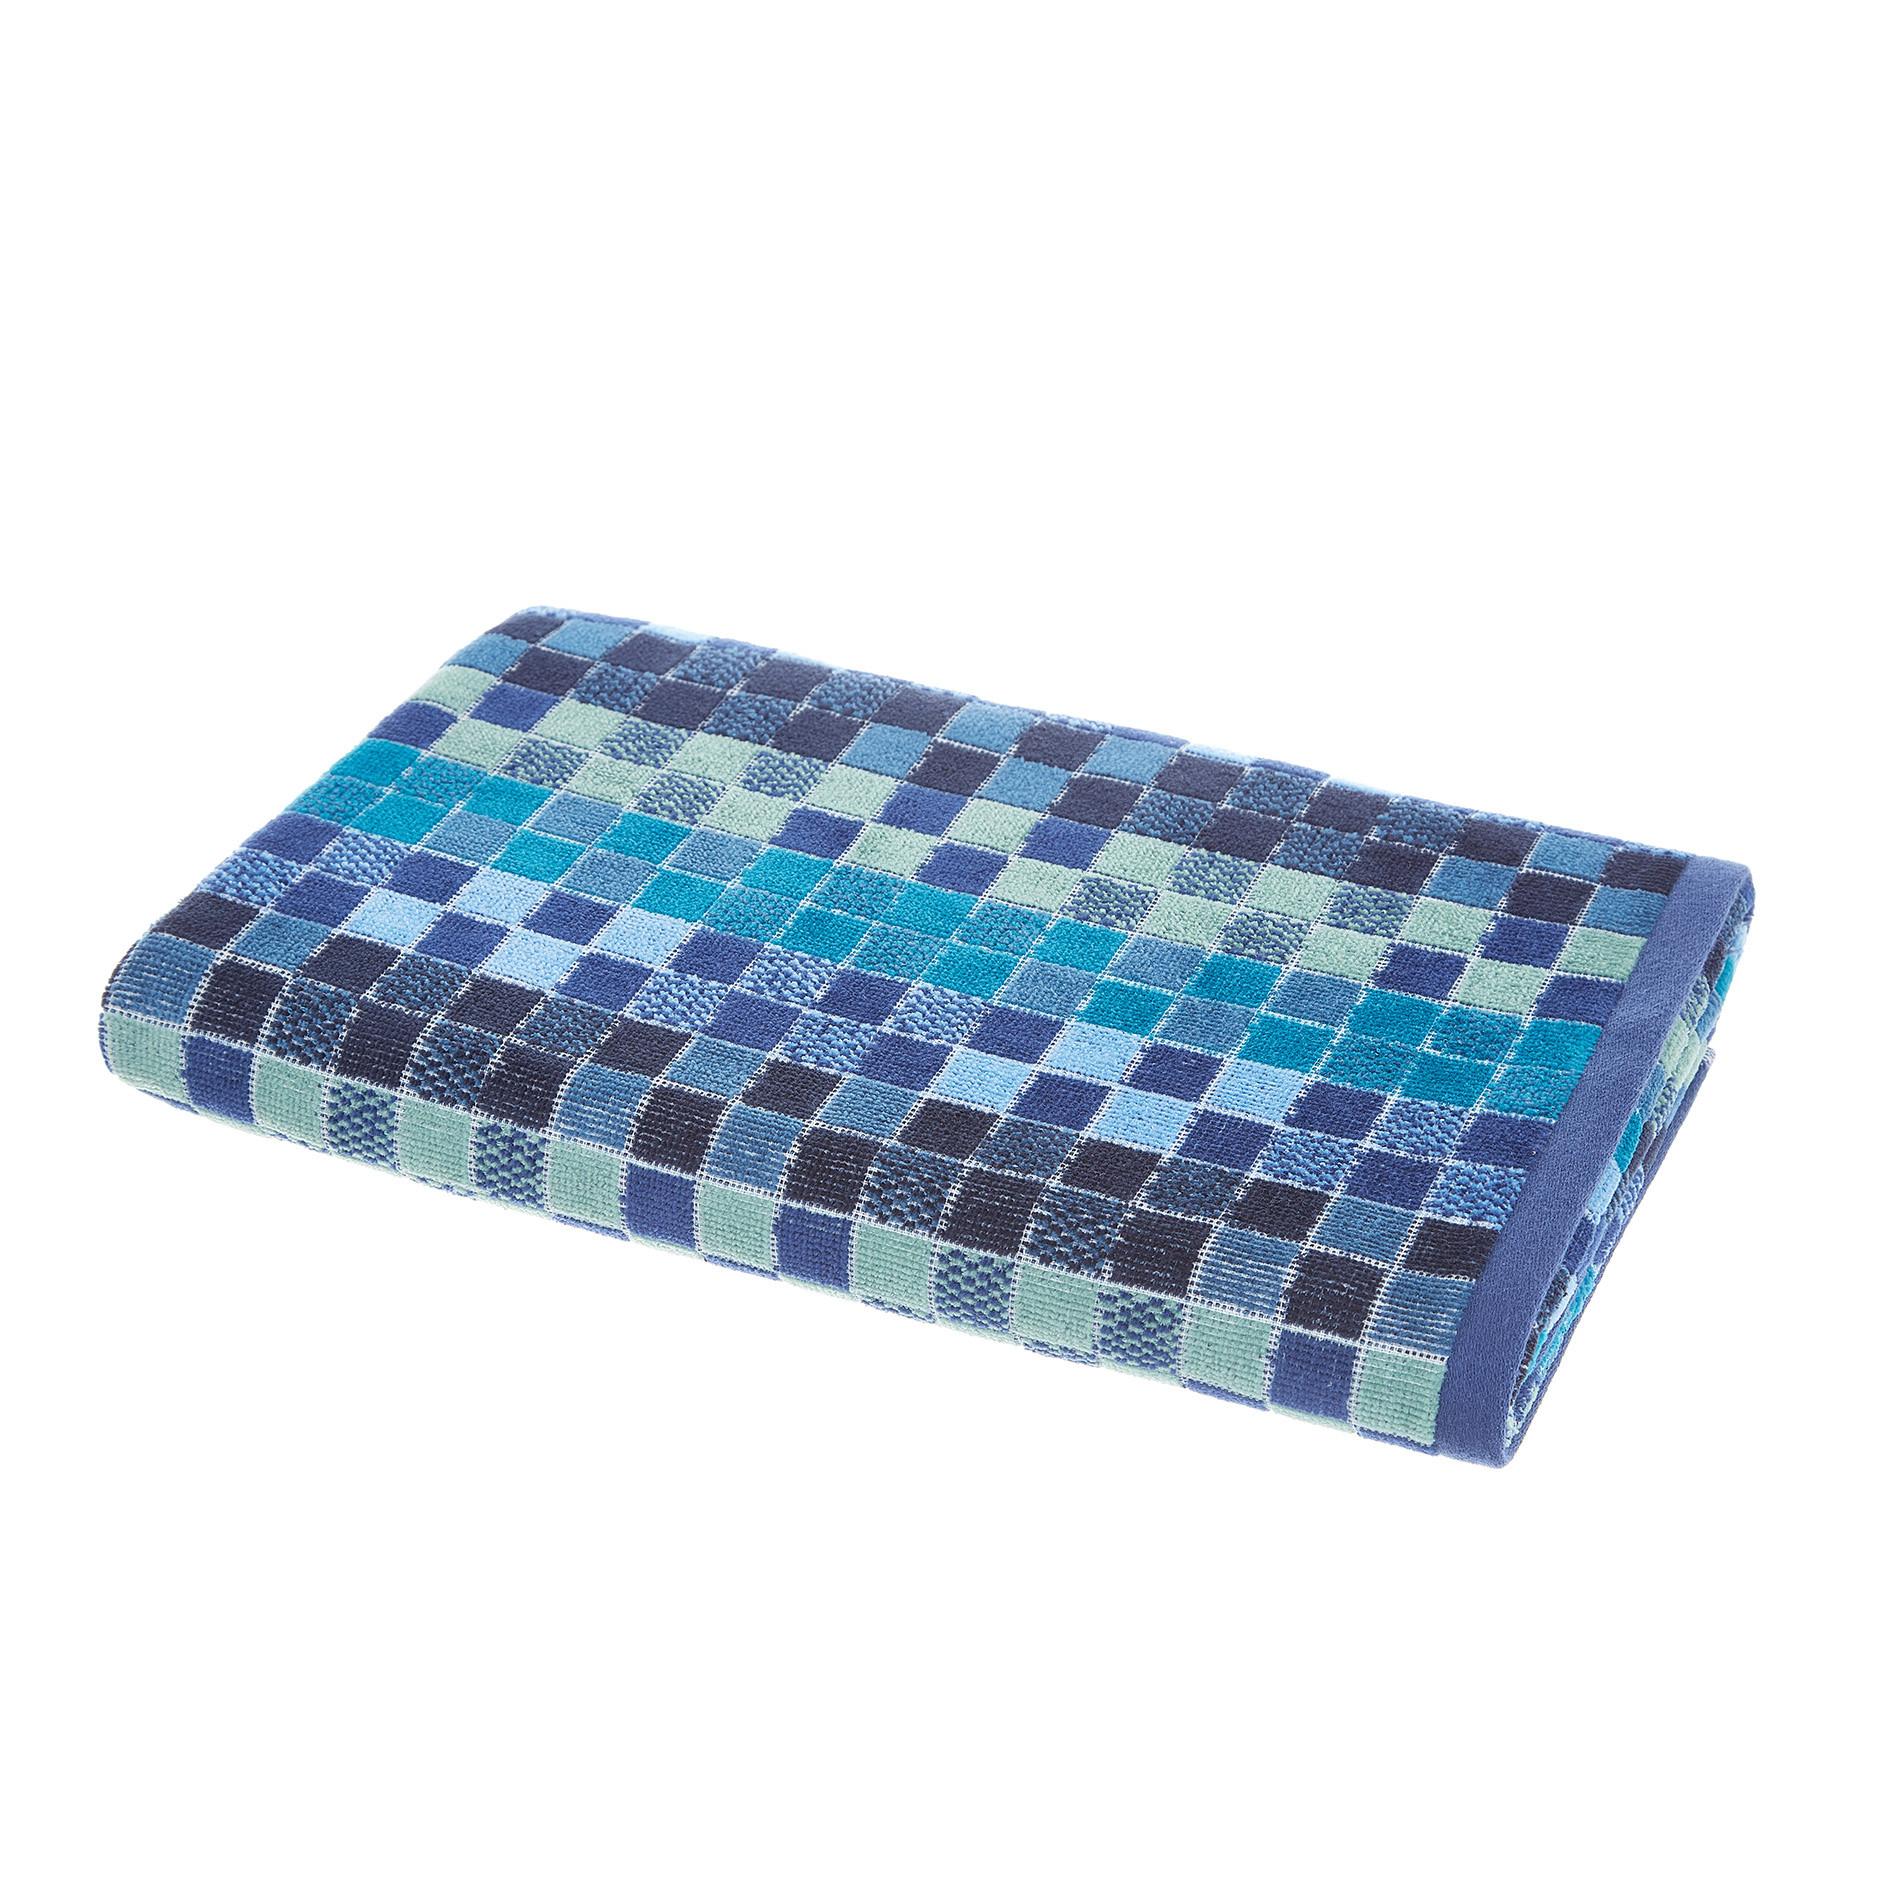 Asciugamano cotone velour fantasia mosaico, Blu, large image number 1